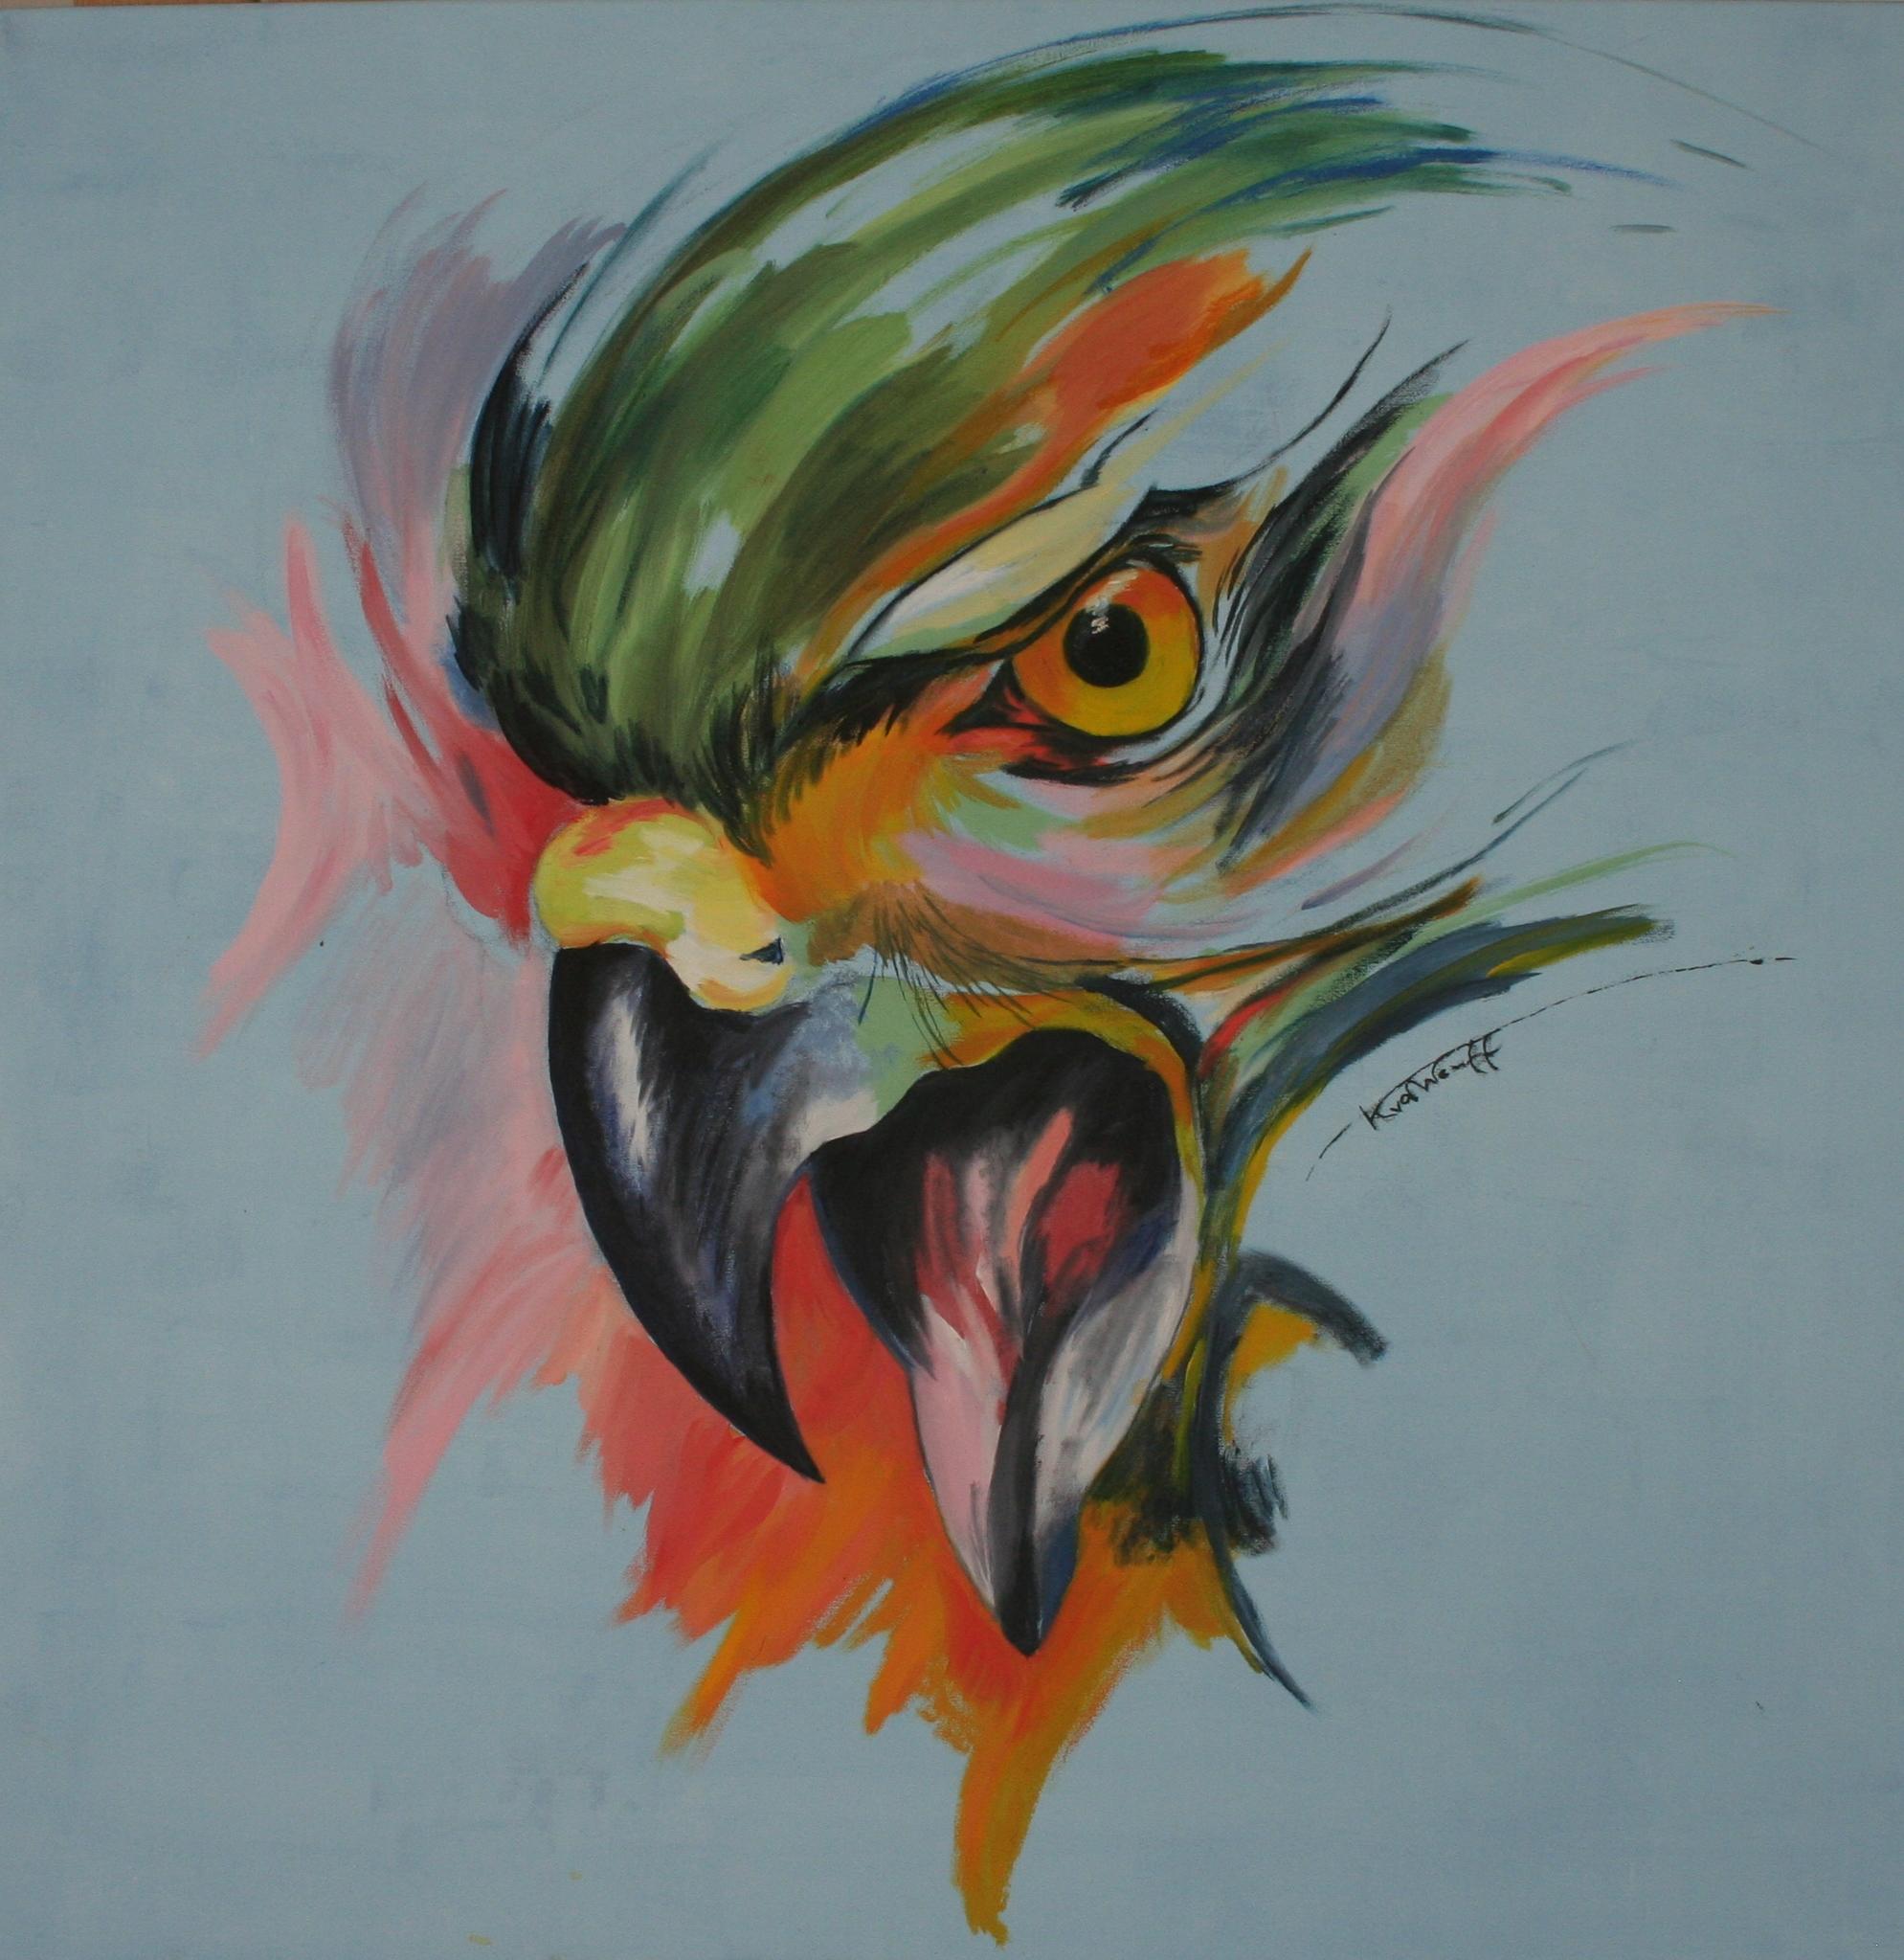 Angry bird, boze vogel, agressie